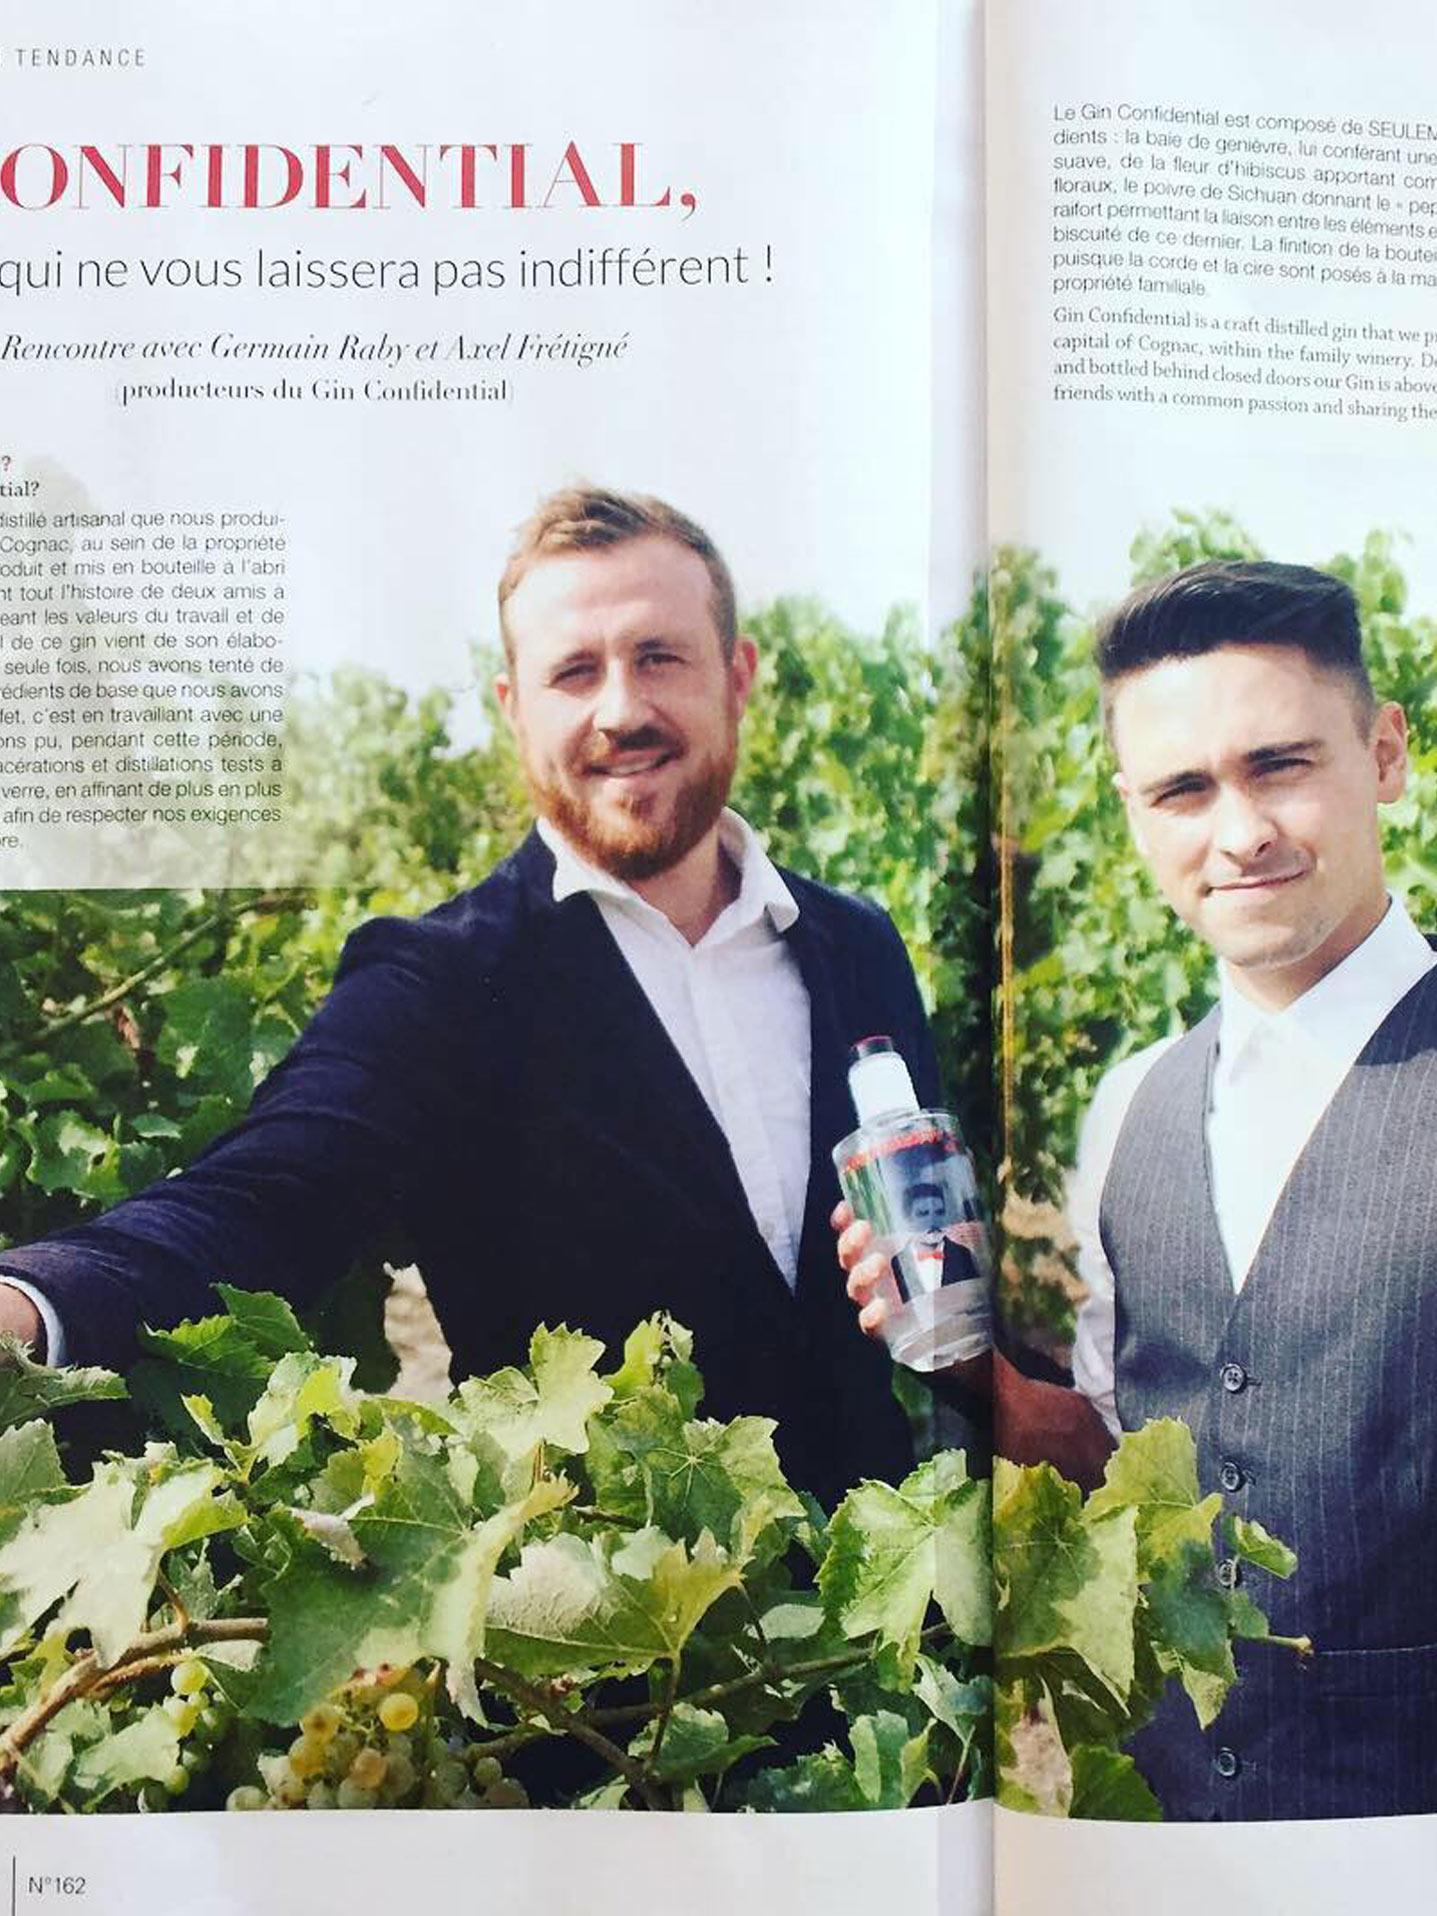 gin artisanal français- gin confidential- gin producteur